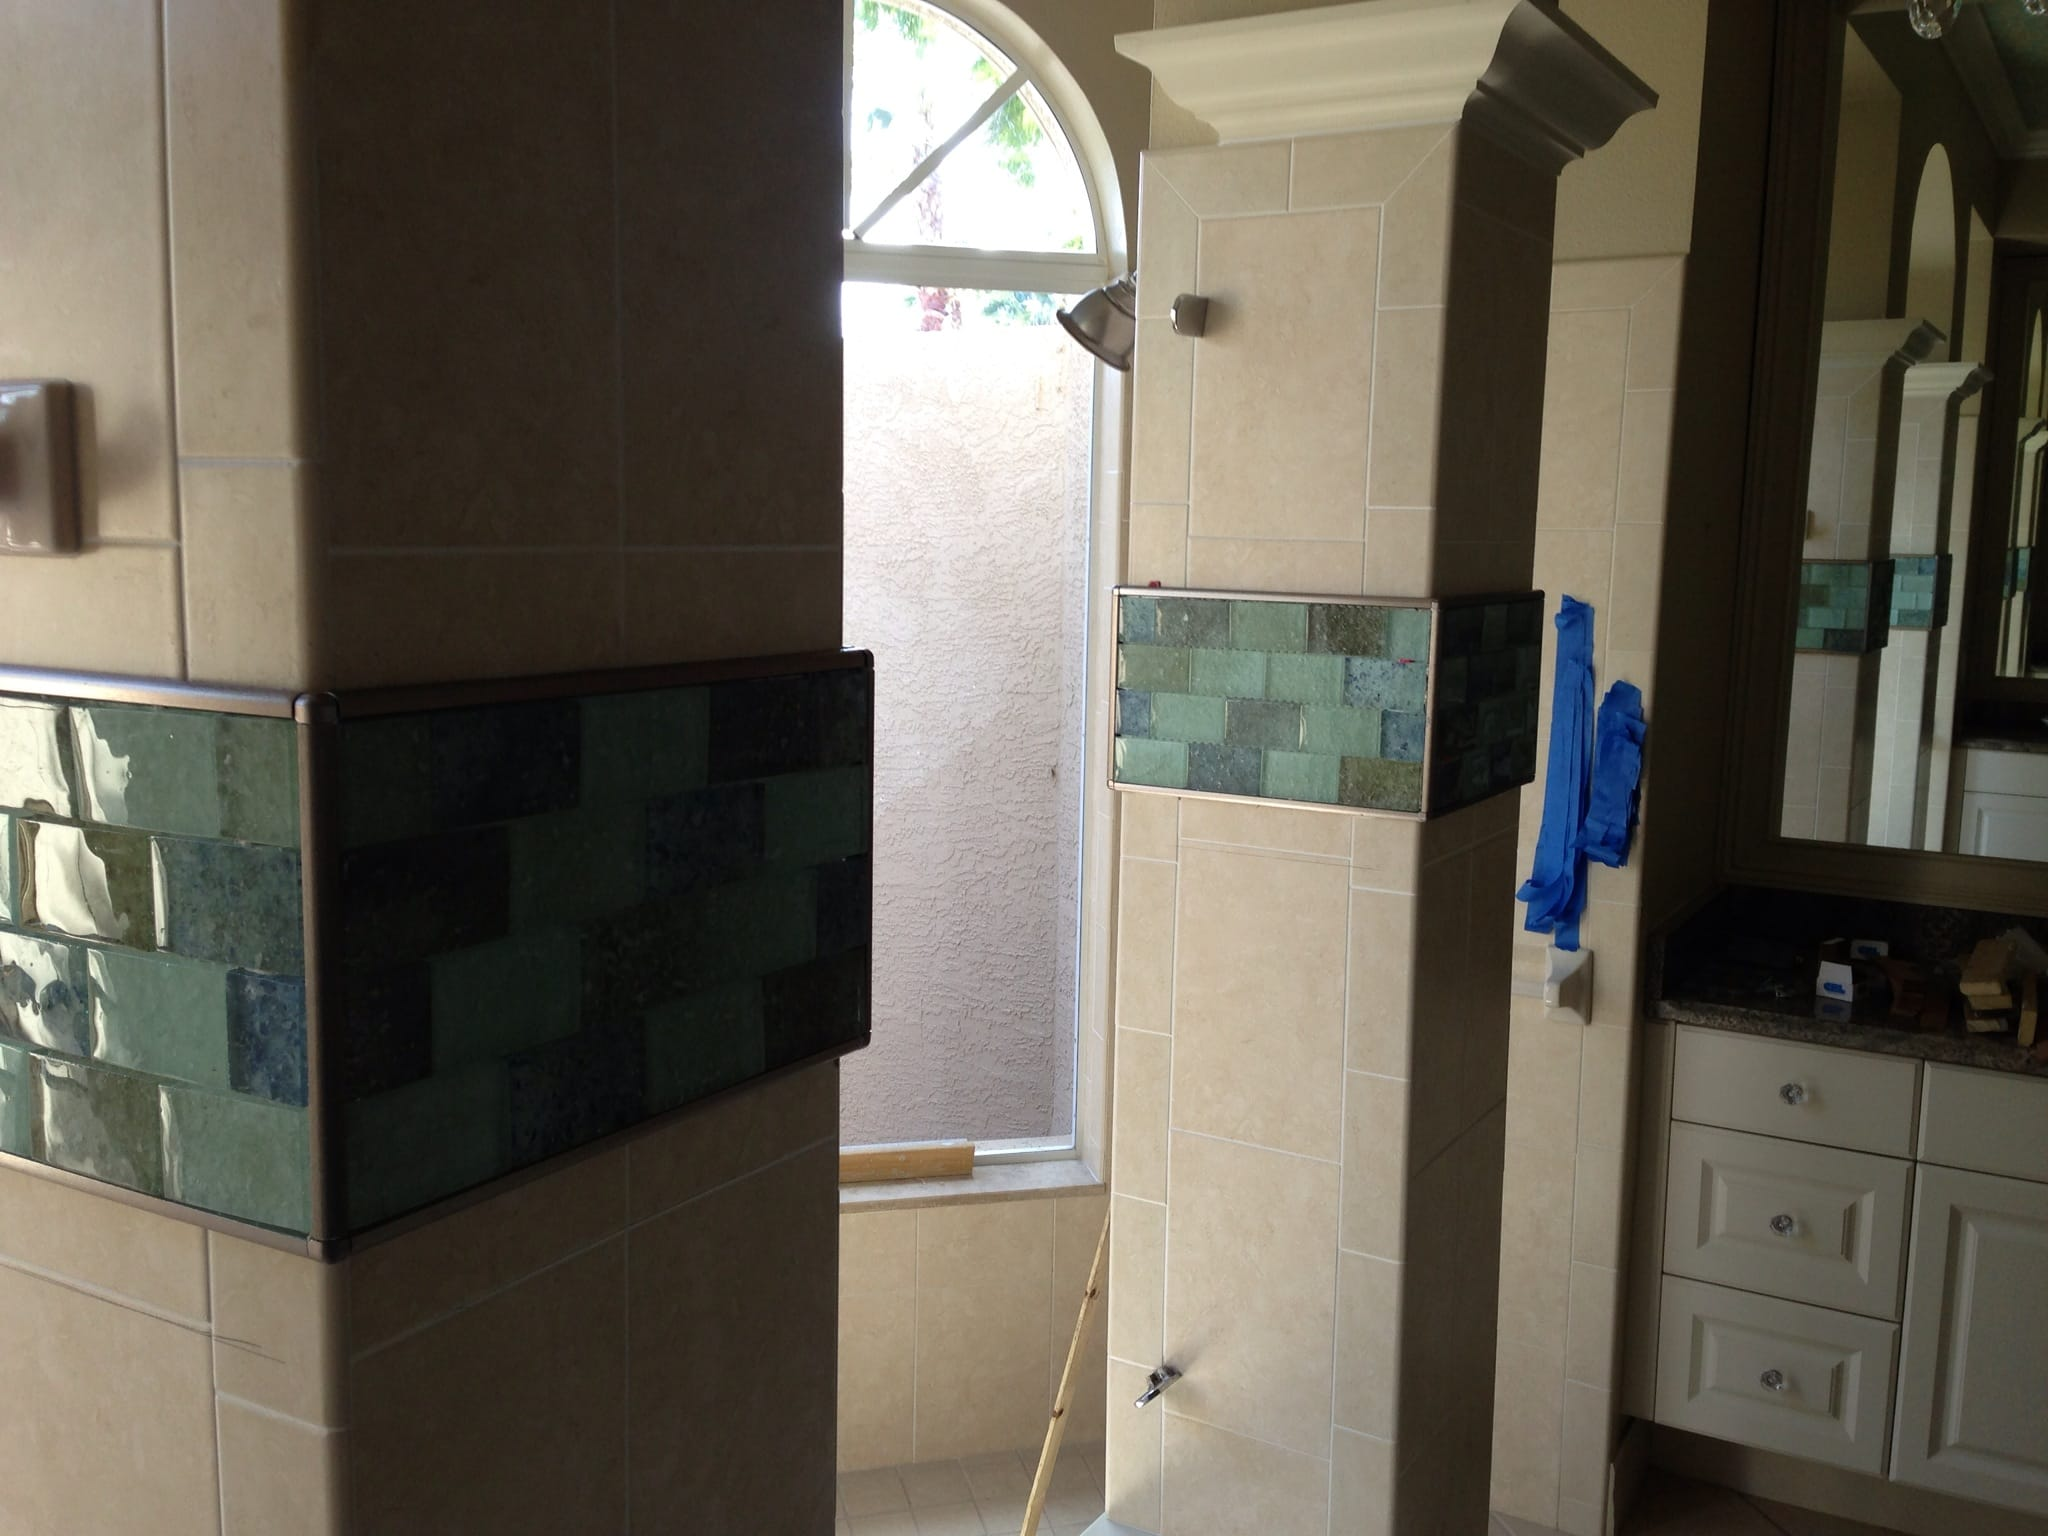 Tile Tile And More Tile Mann Tile Design Studio And